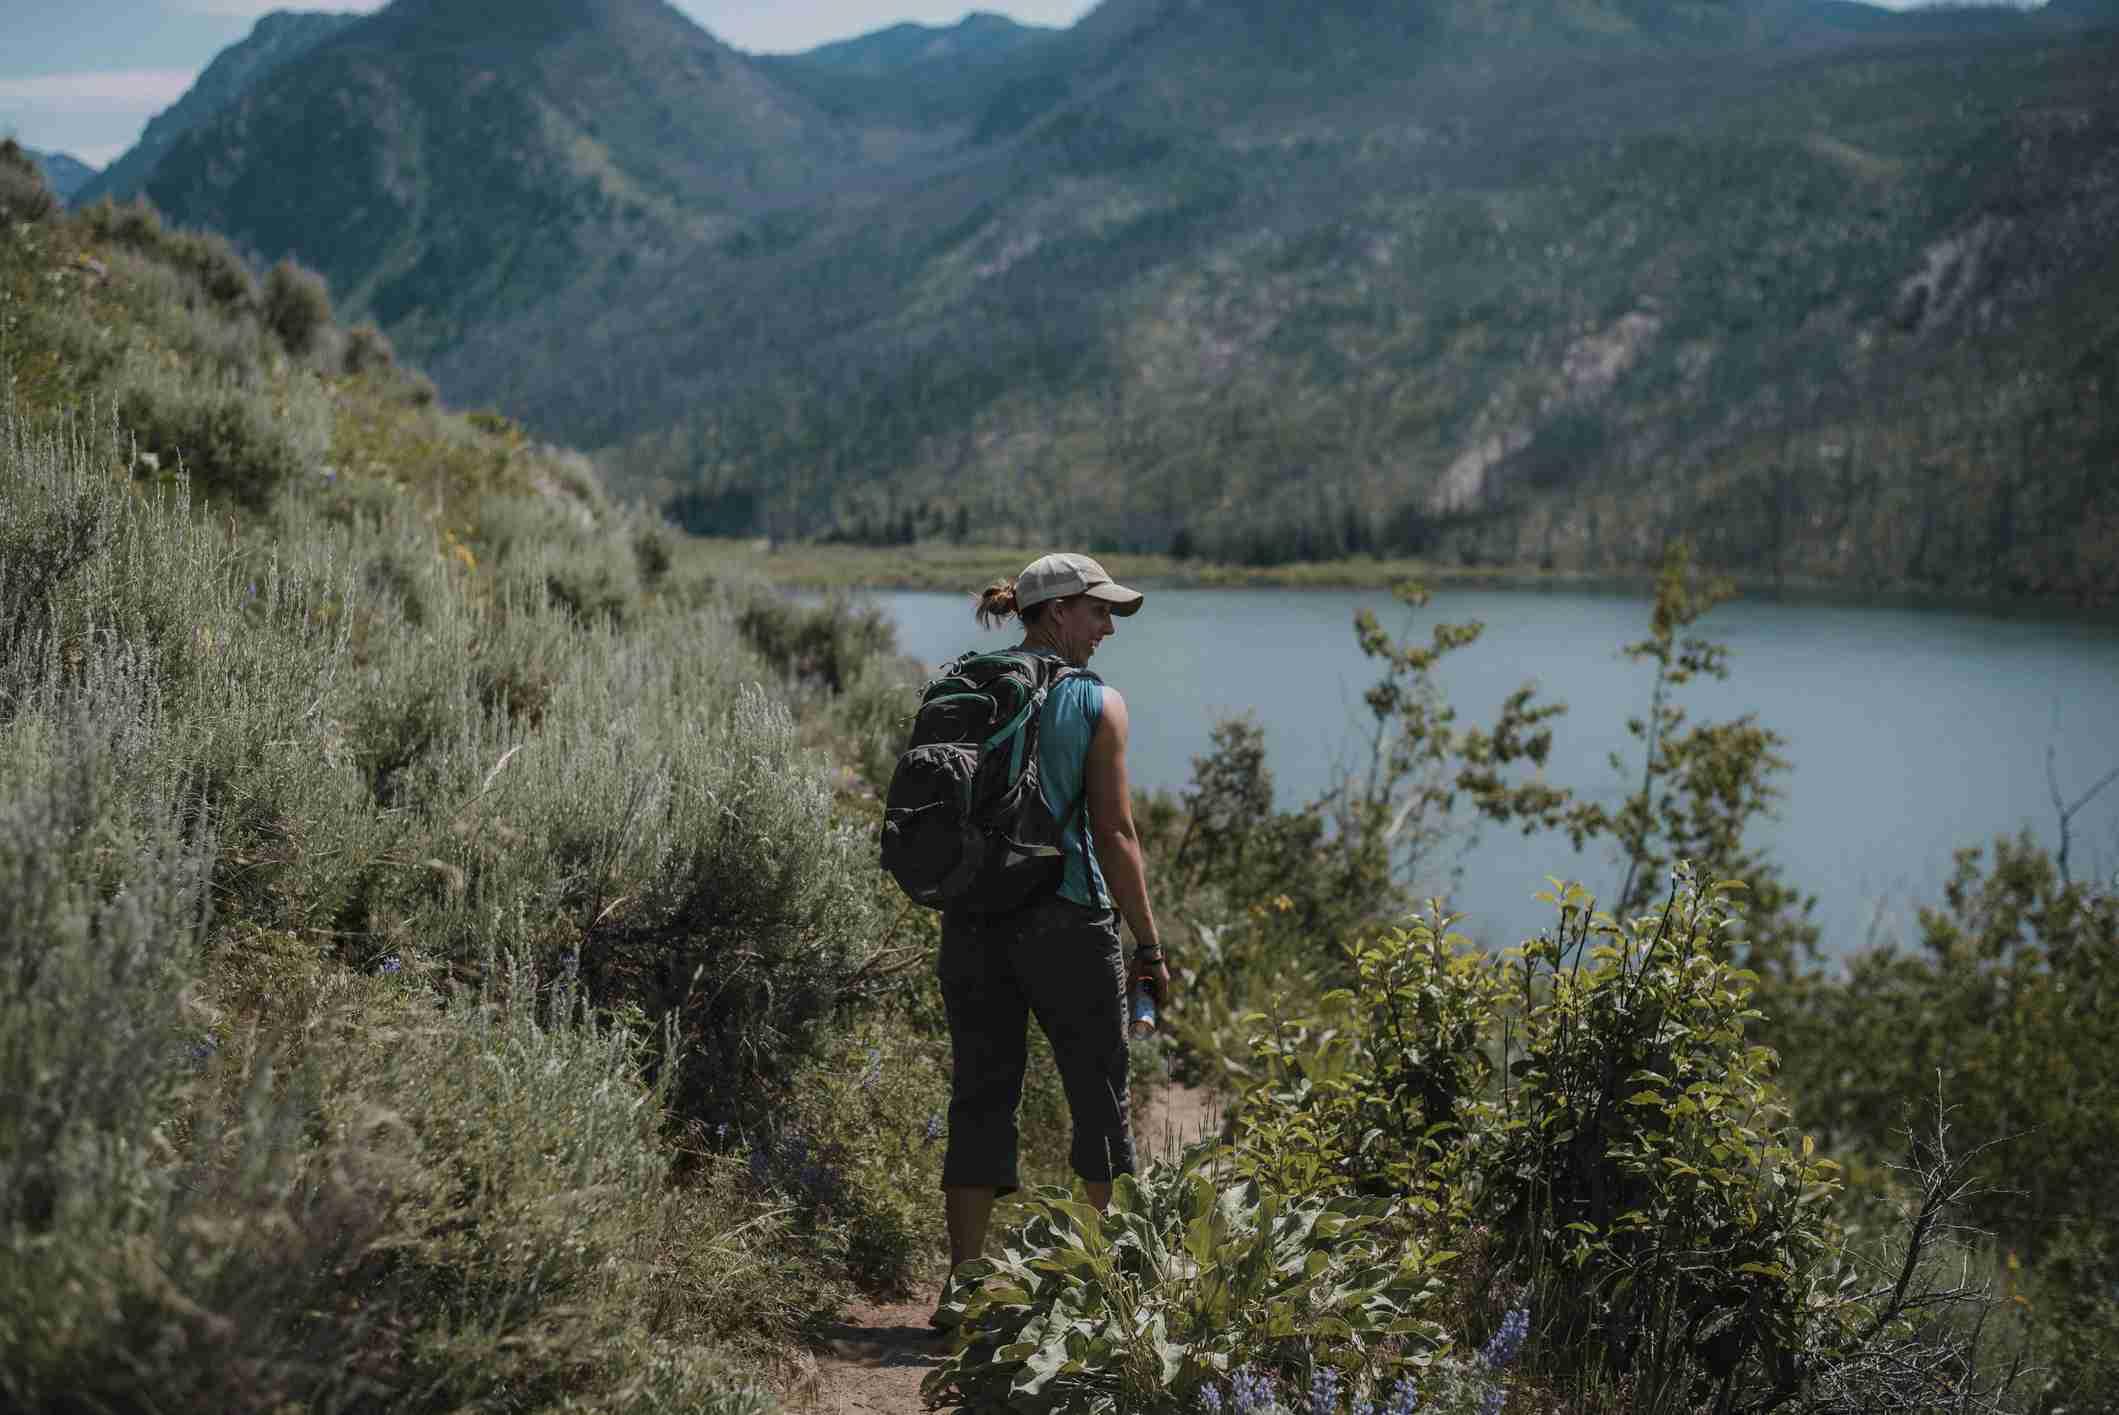 Female hiker standing in field of plants in Wyoming